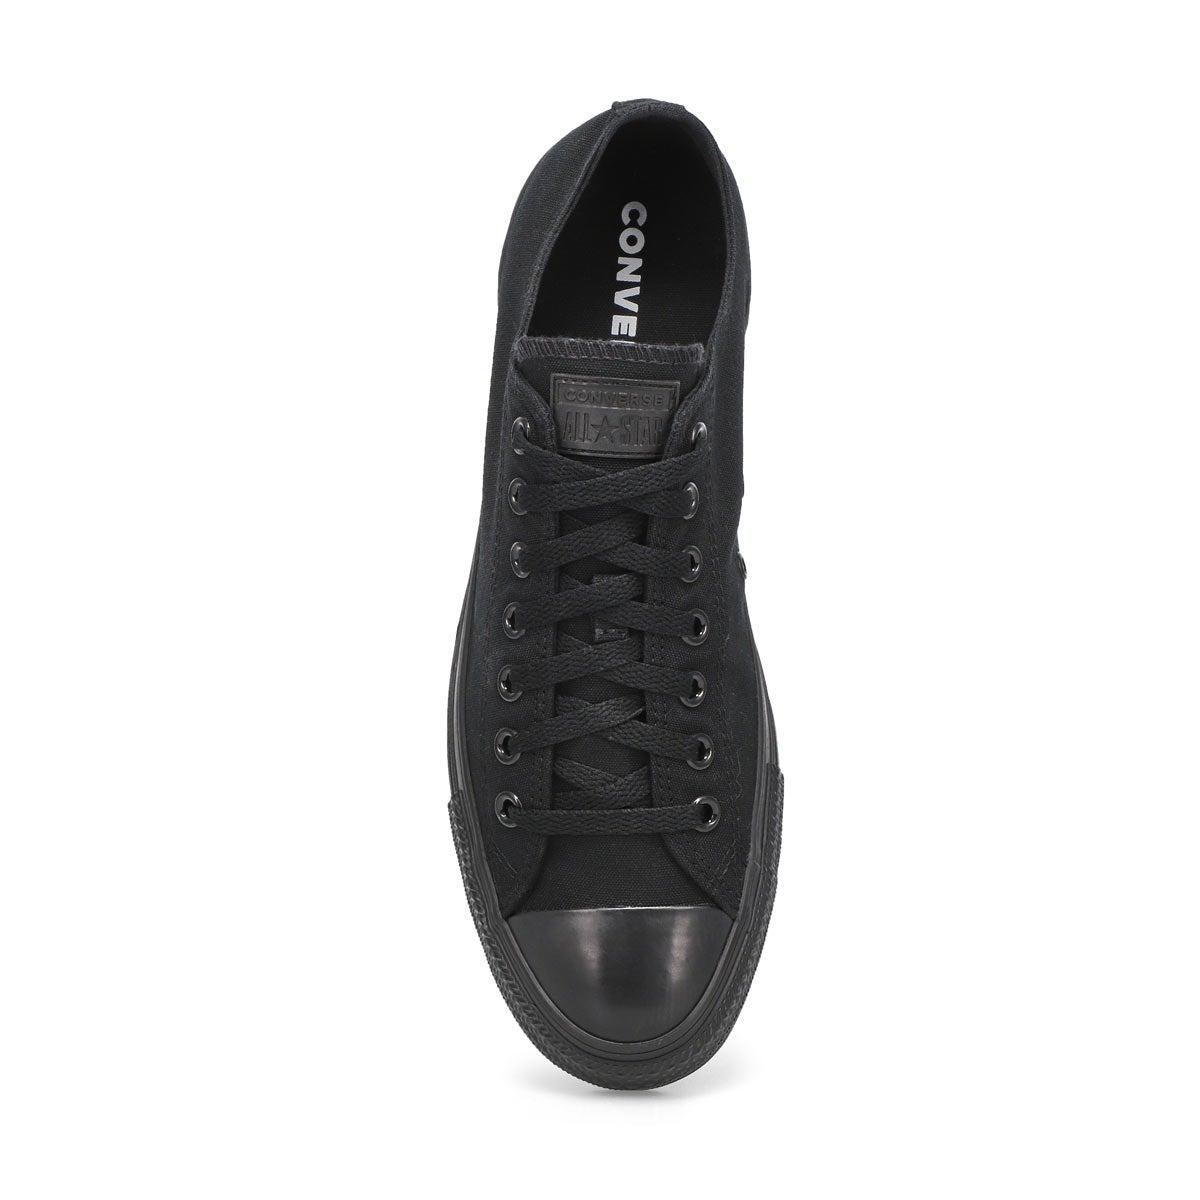 Men's CHUCK TAYLOR CORE OX black sneakers